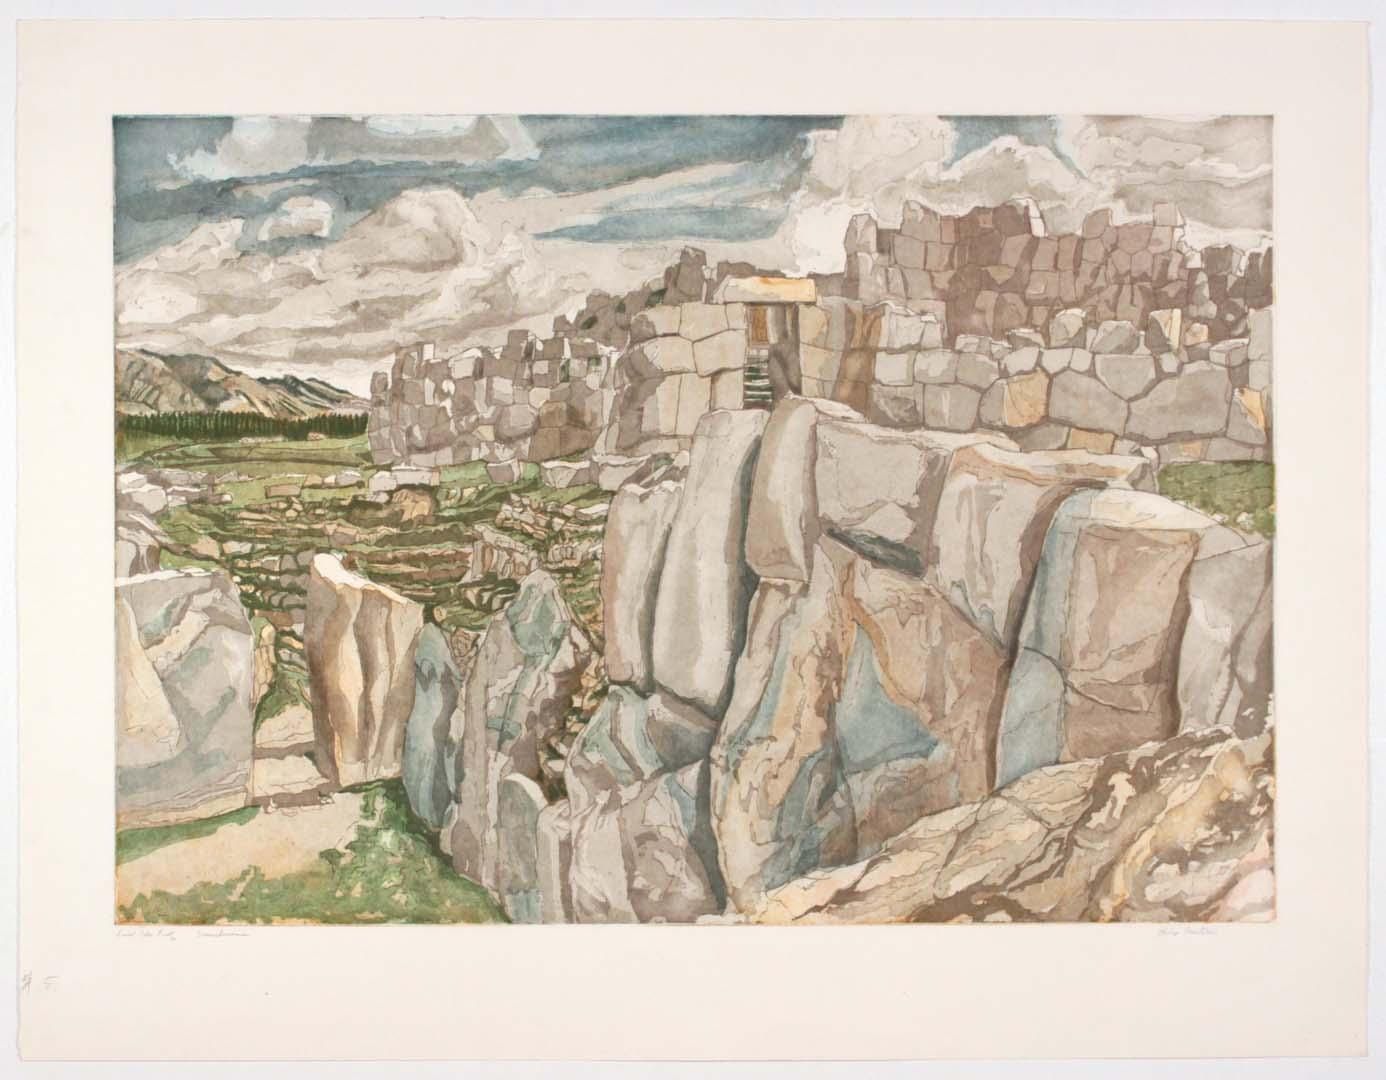 1979 Sacsahuman Aquatint Etching on Paper 30.25 x 39.25